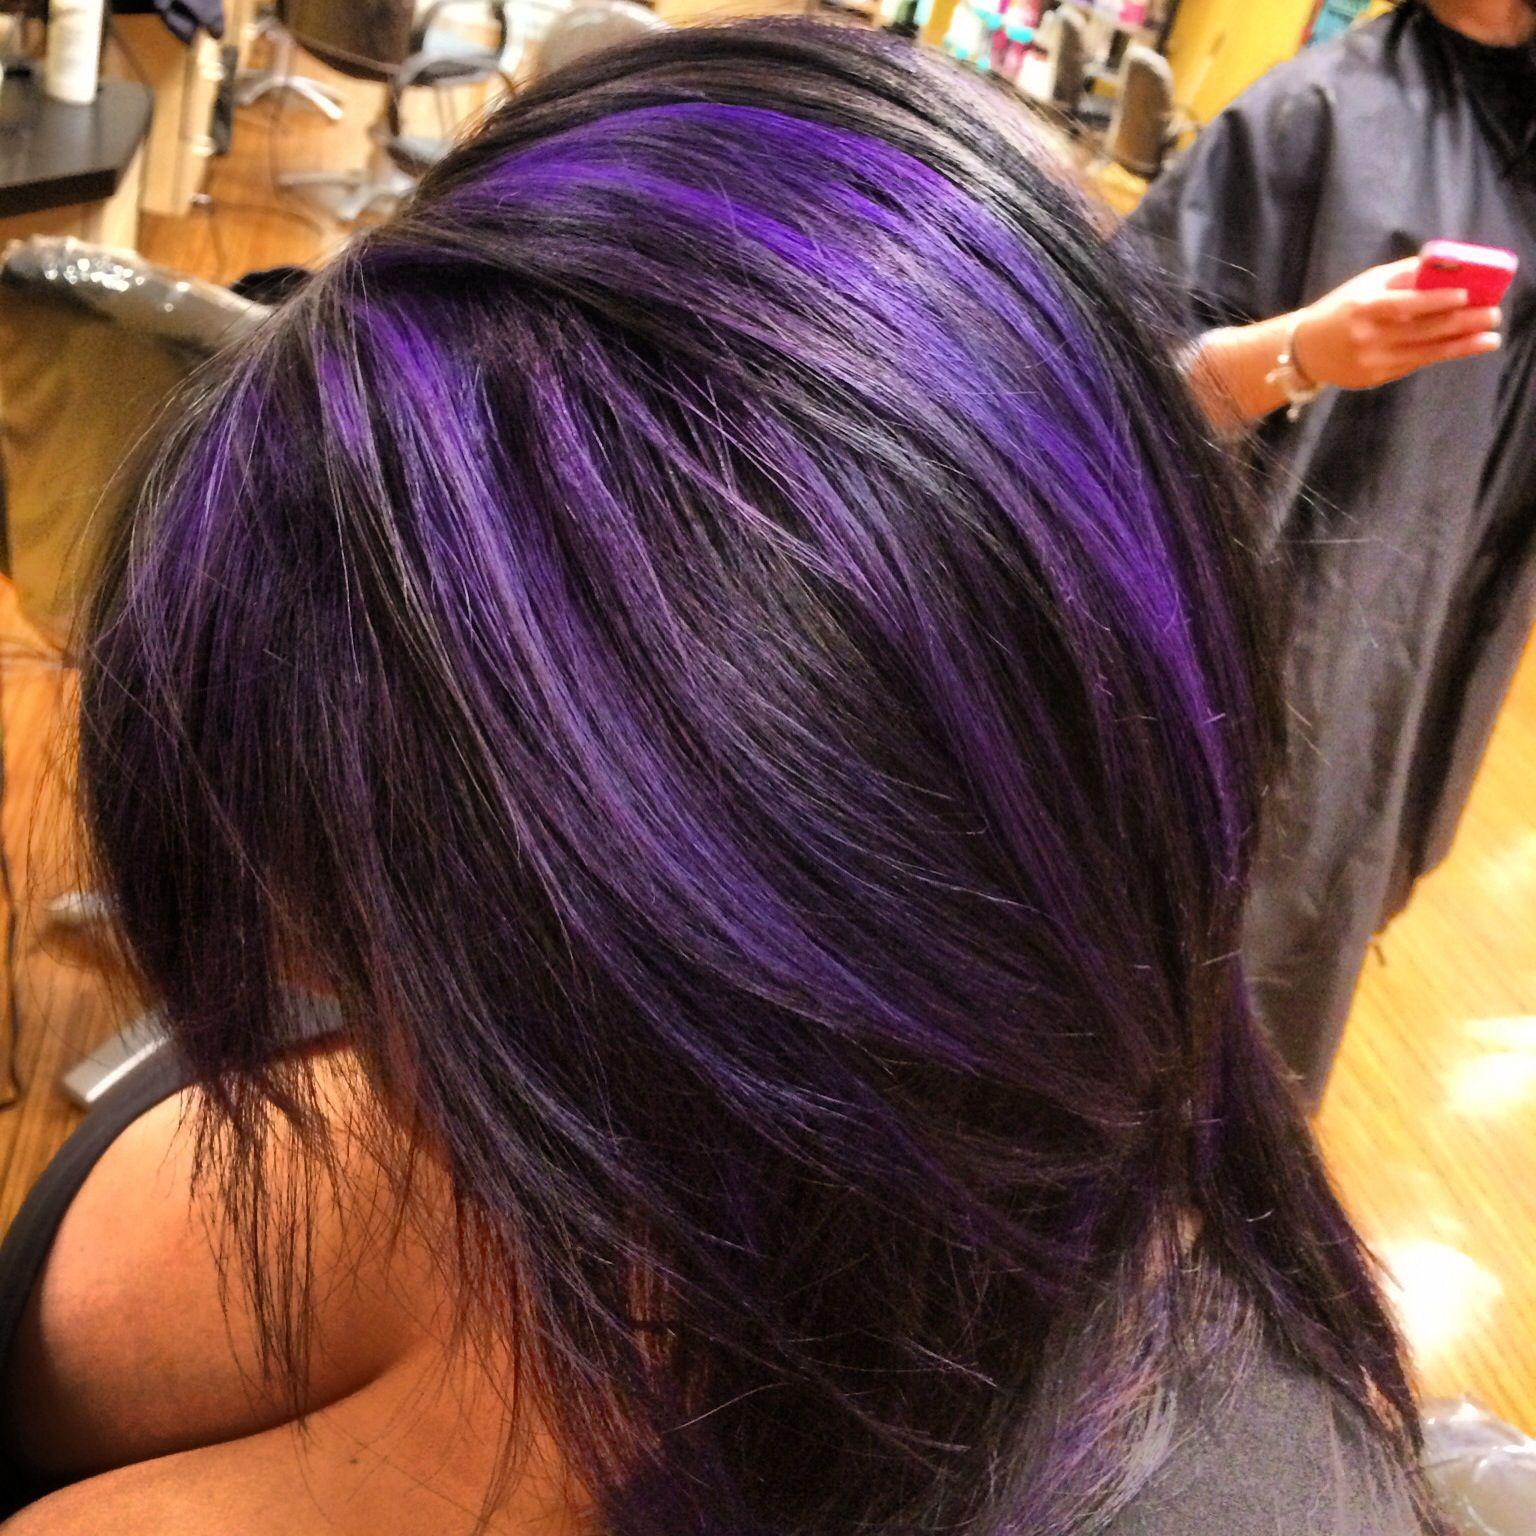 kristins purple highlights black hair hair done nails